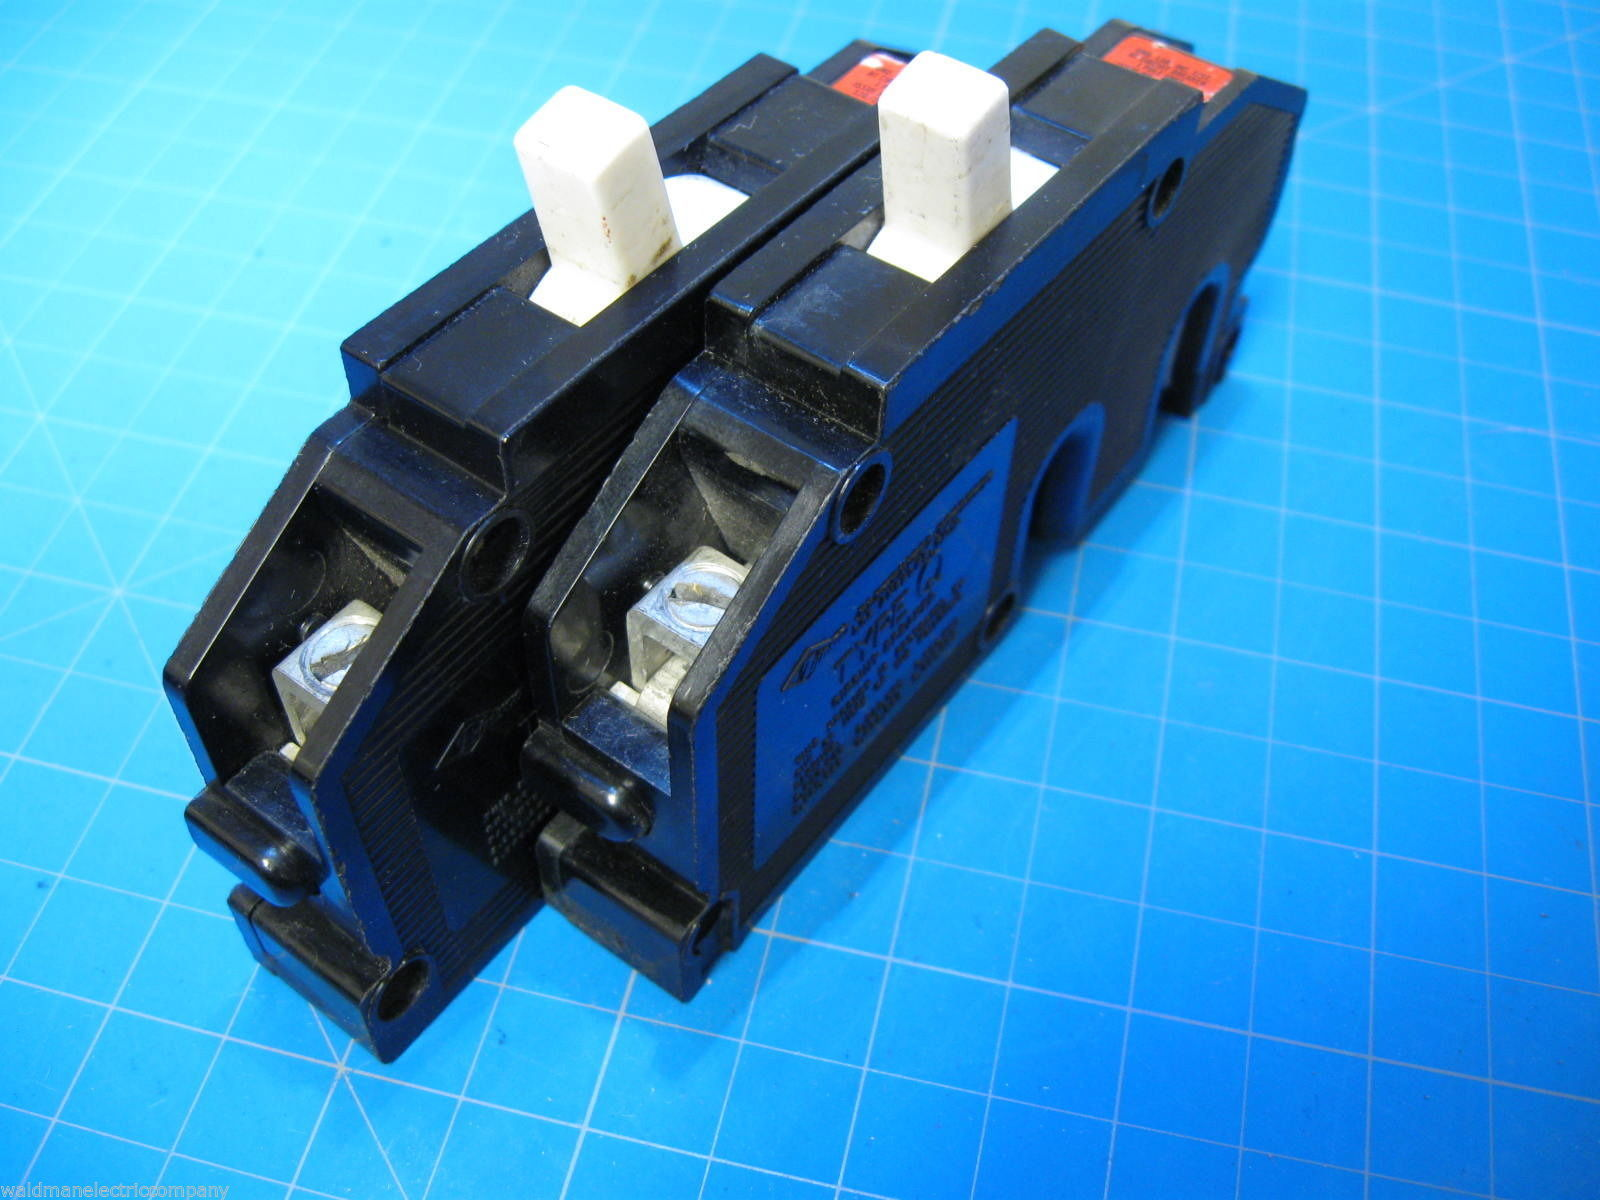 60 amp zinsco gte sylvania magnetrip 1 pole breaker type q. Black Bedroom Furniture Sets. Home Design Ideas